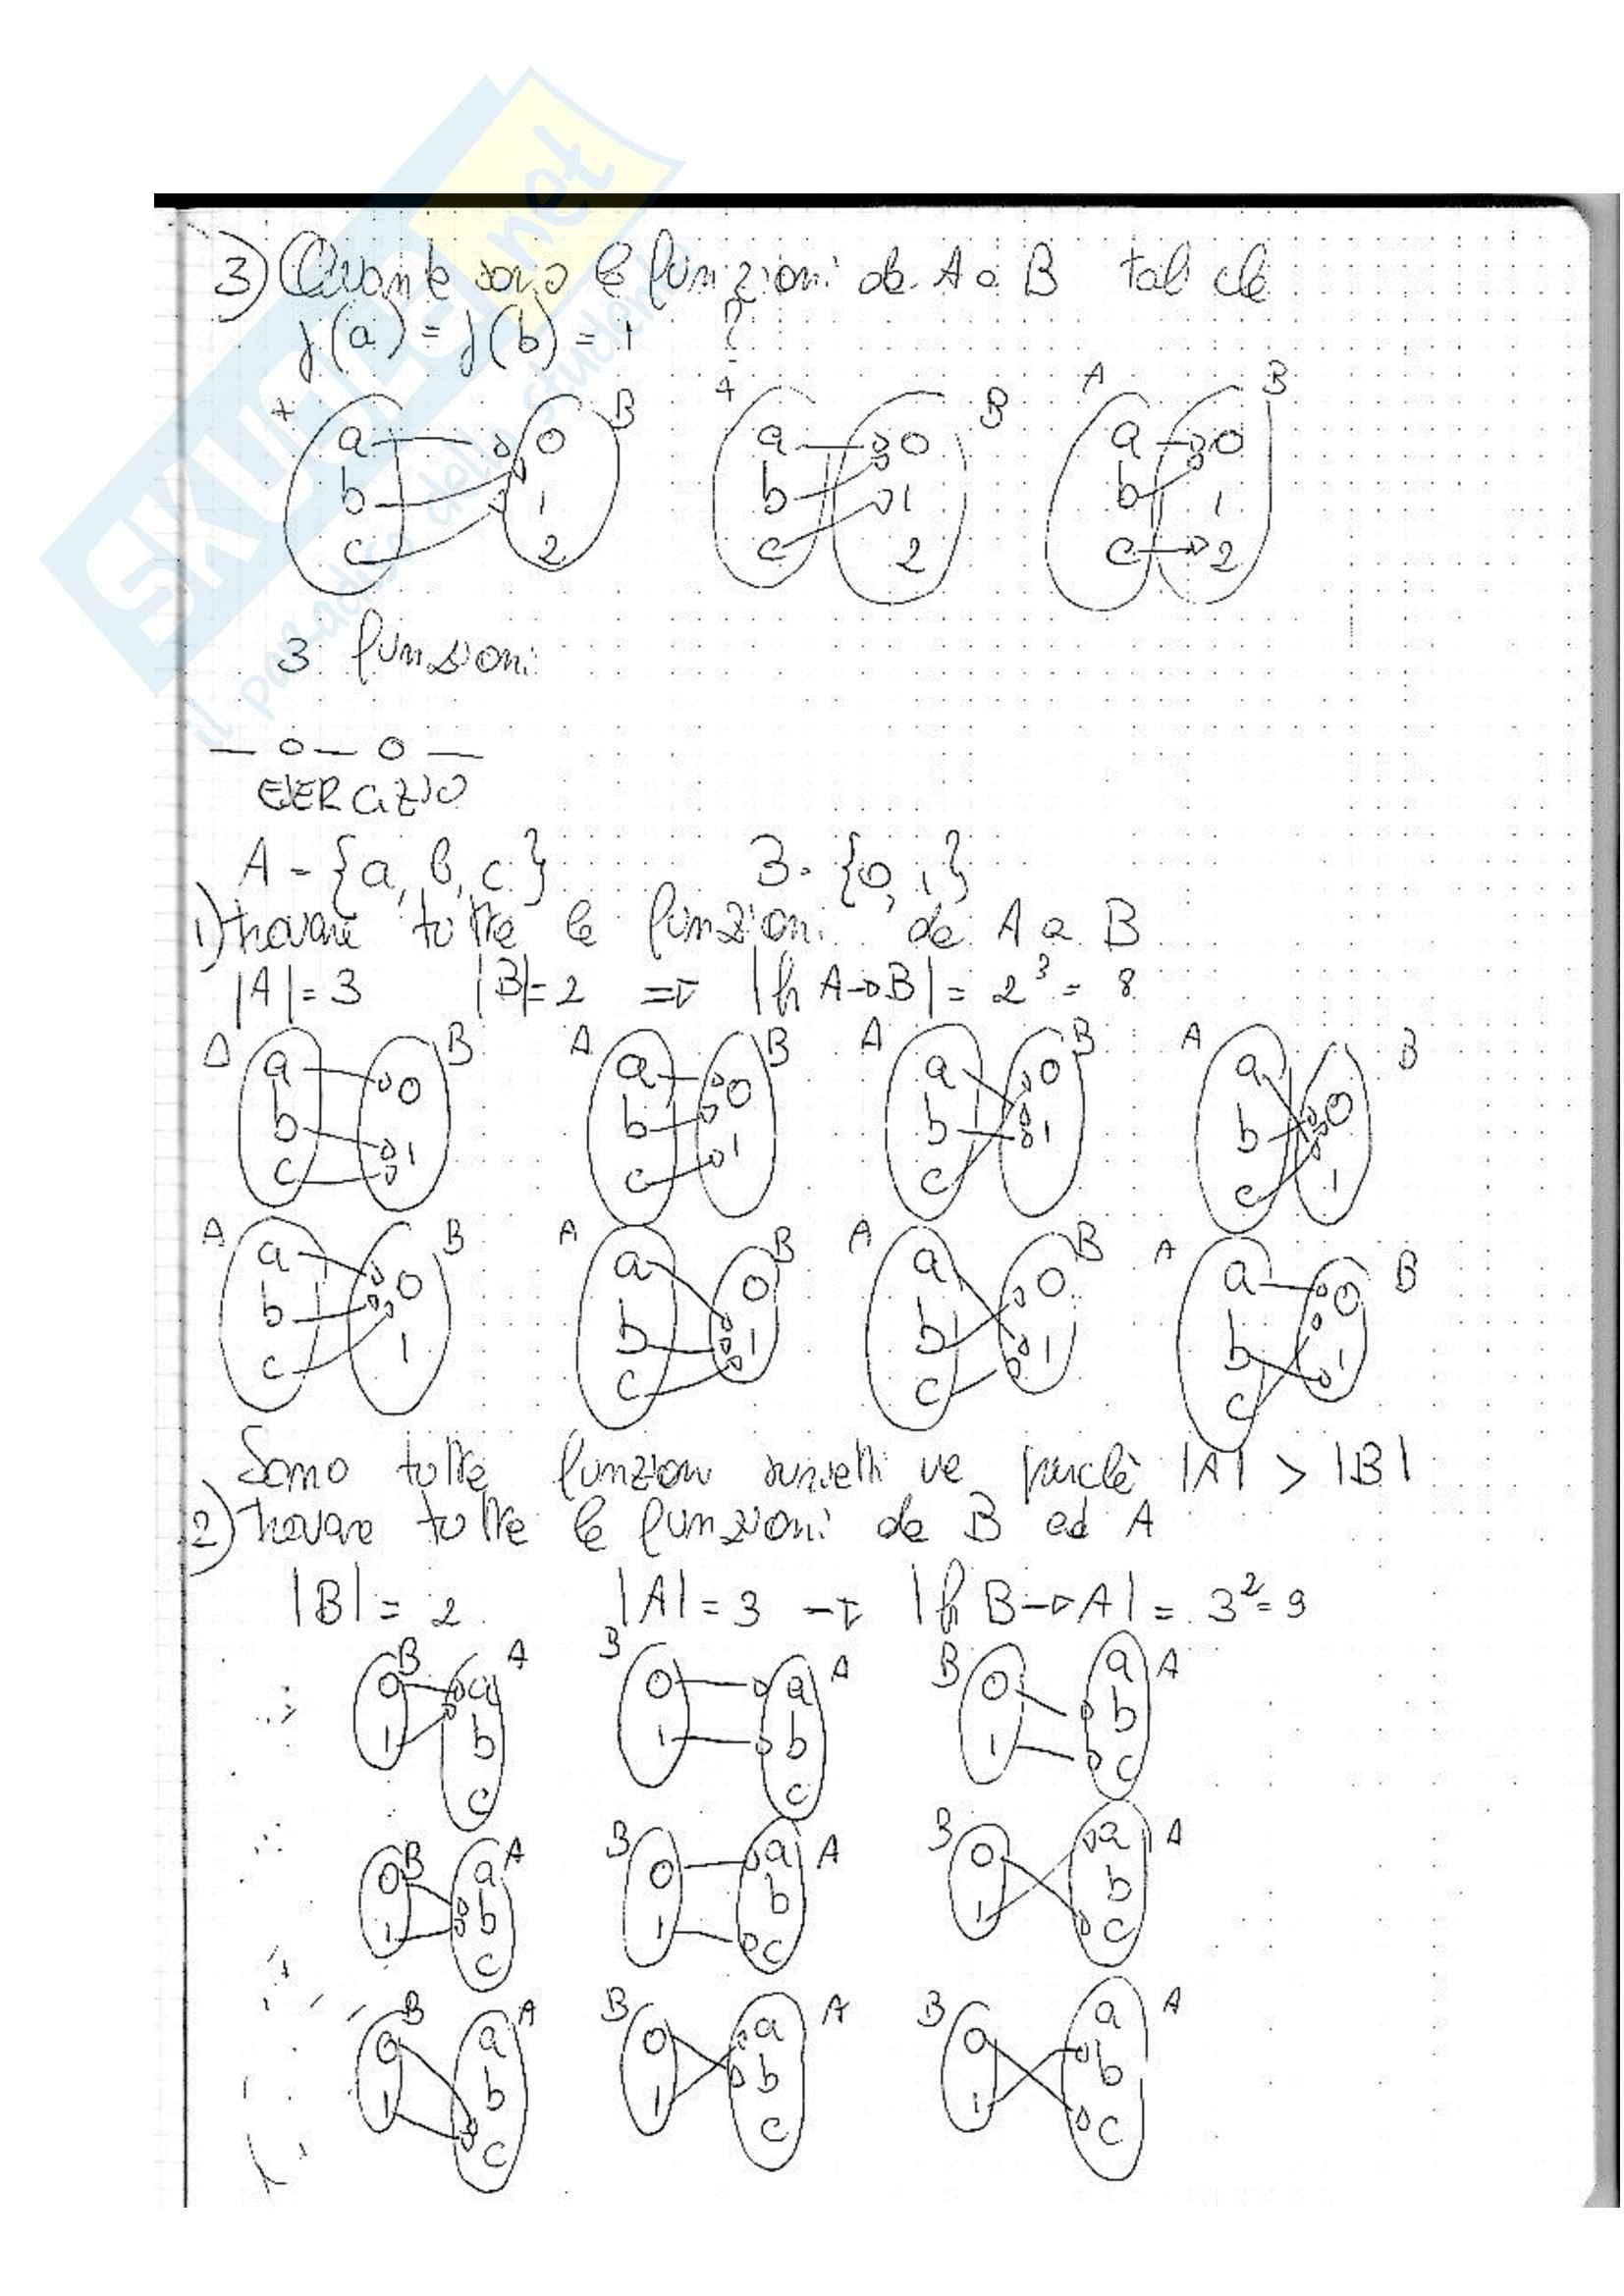 Istituzioni di matematica - Appunti Pag. 26